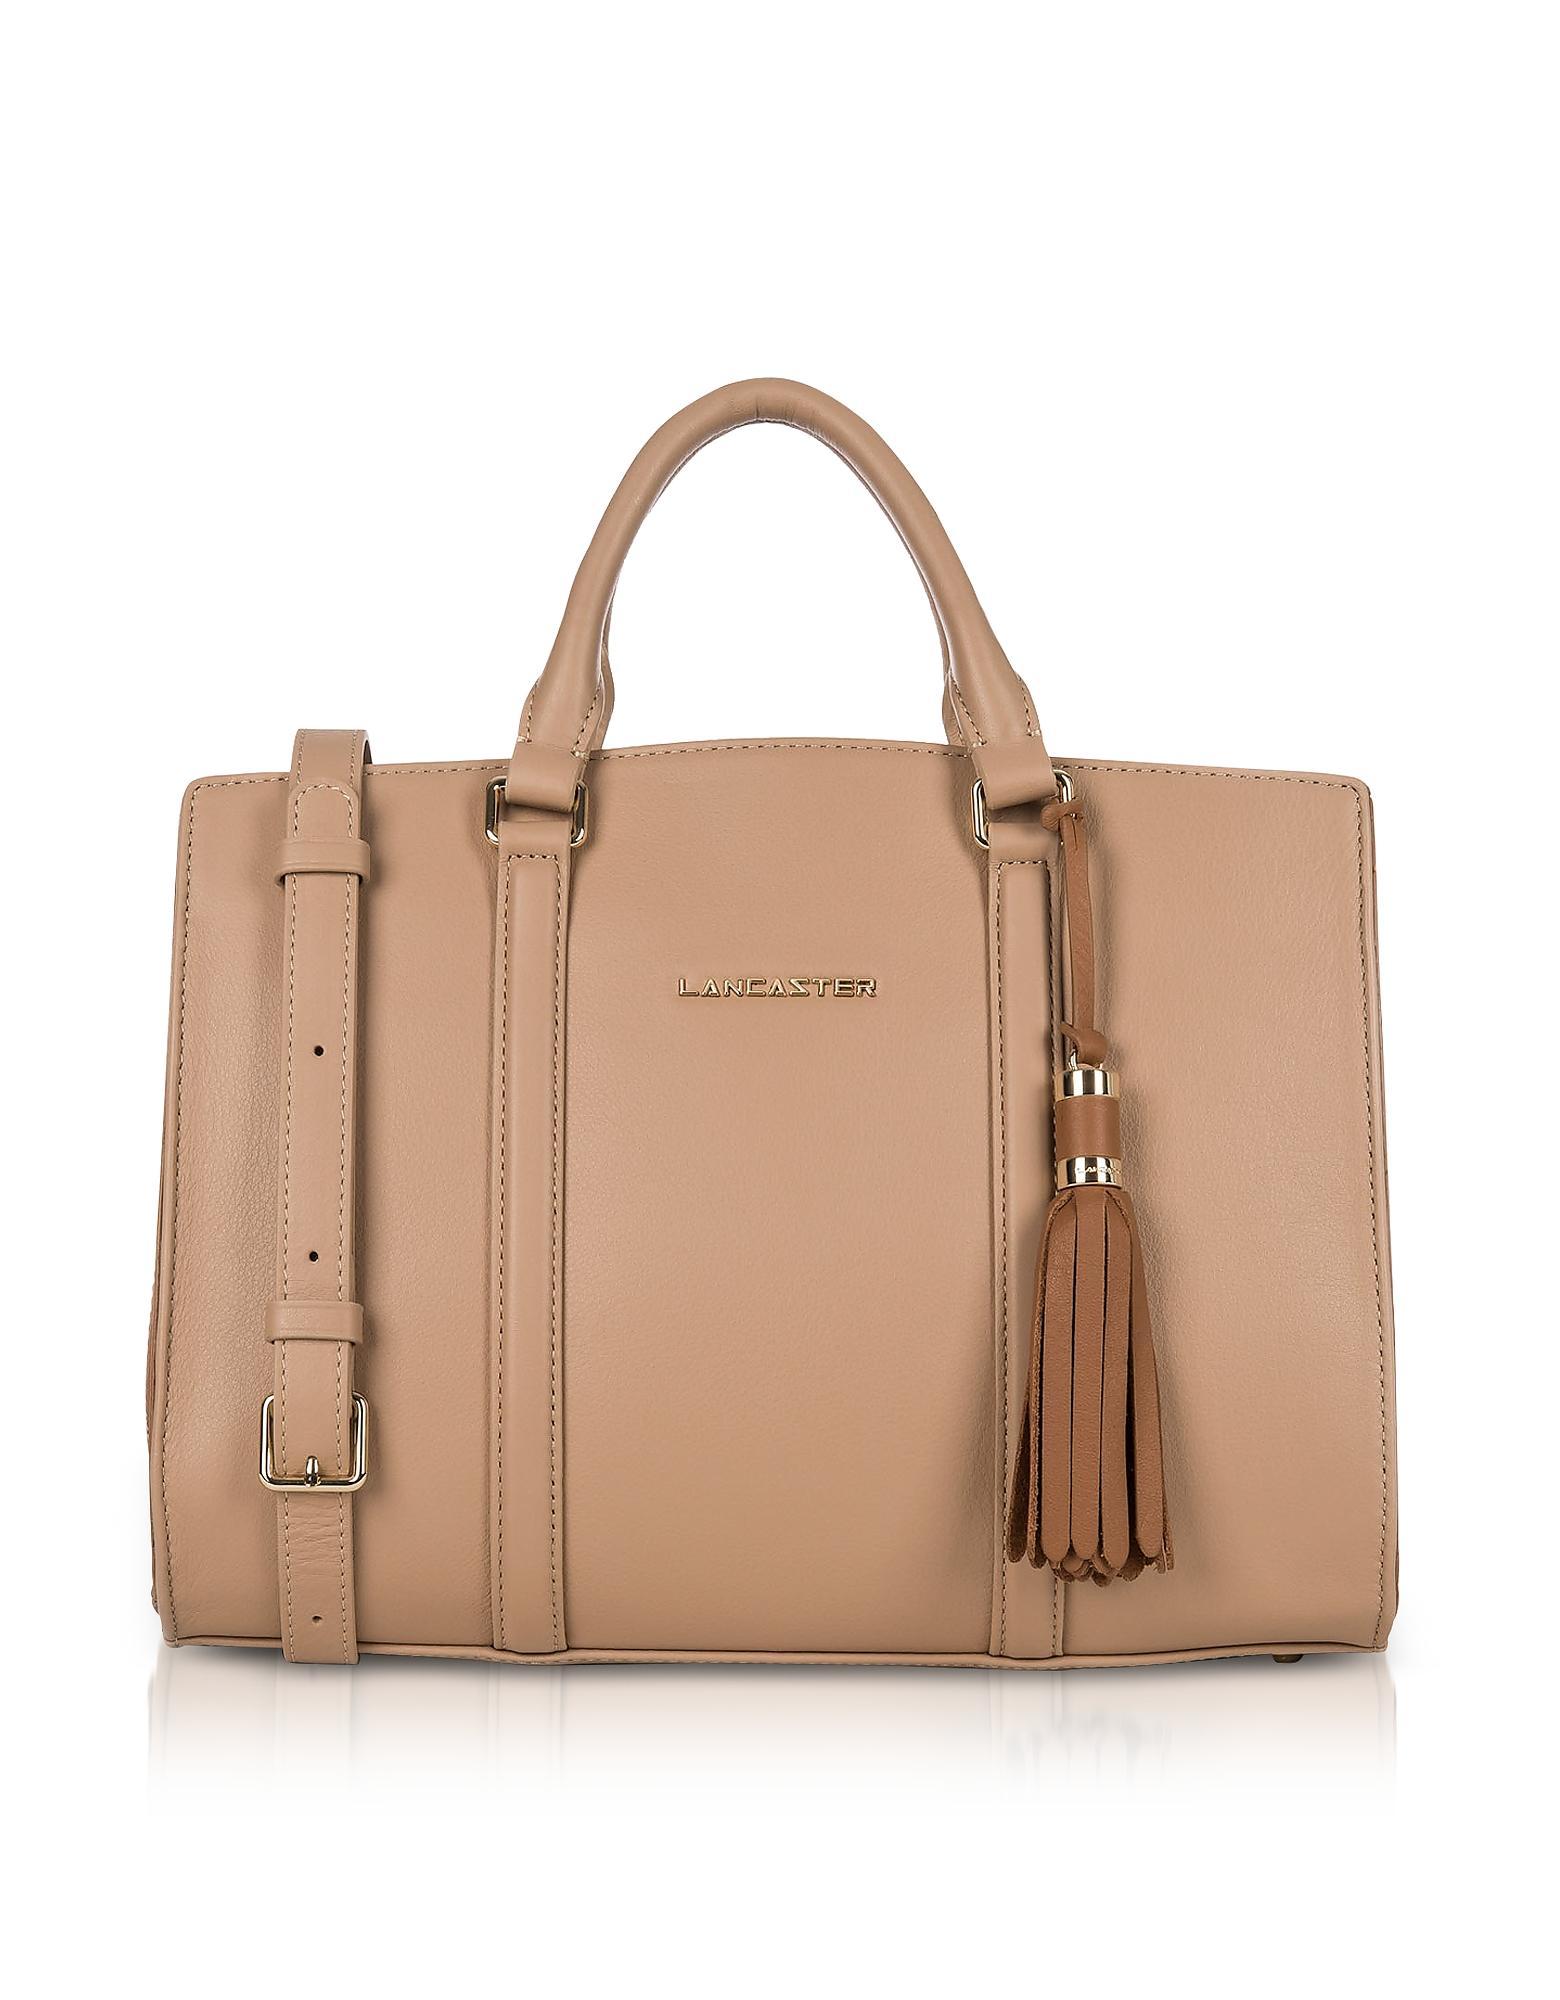 6a718de43e1e Lyst - Lancaster Paris Mademoiselle Ana Nude hazelnut Leather Large ...